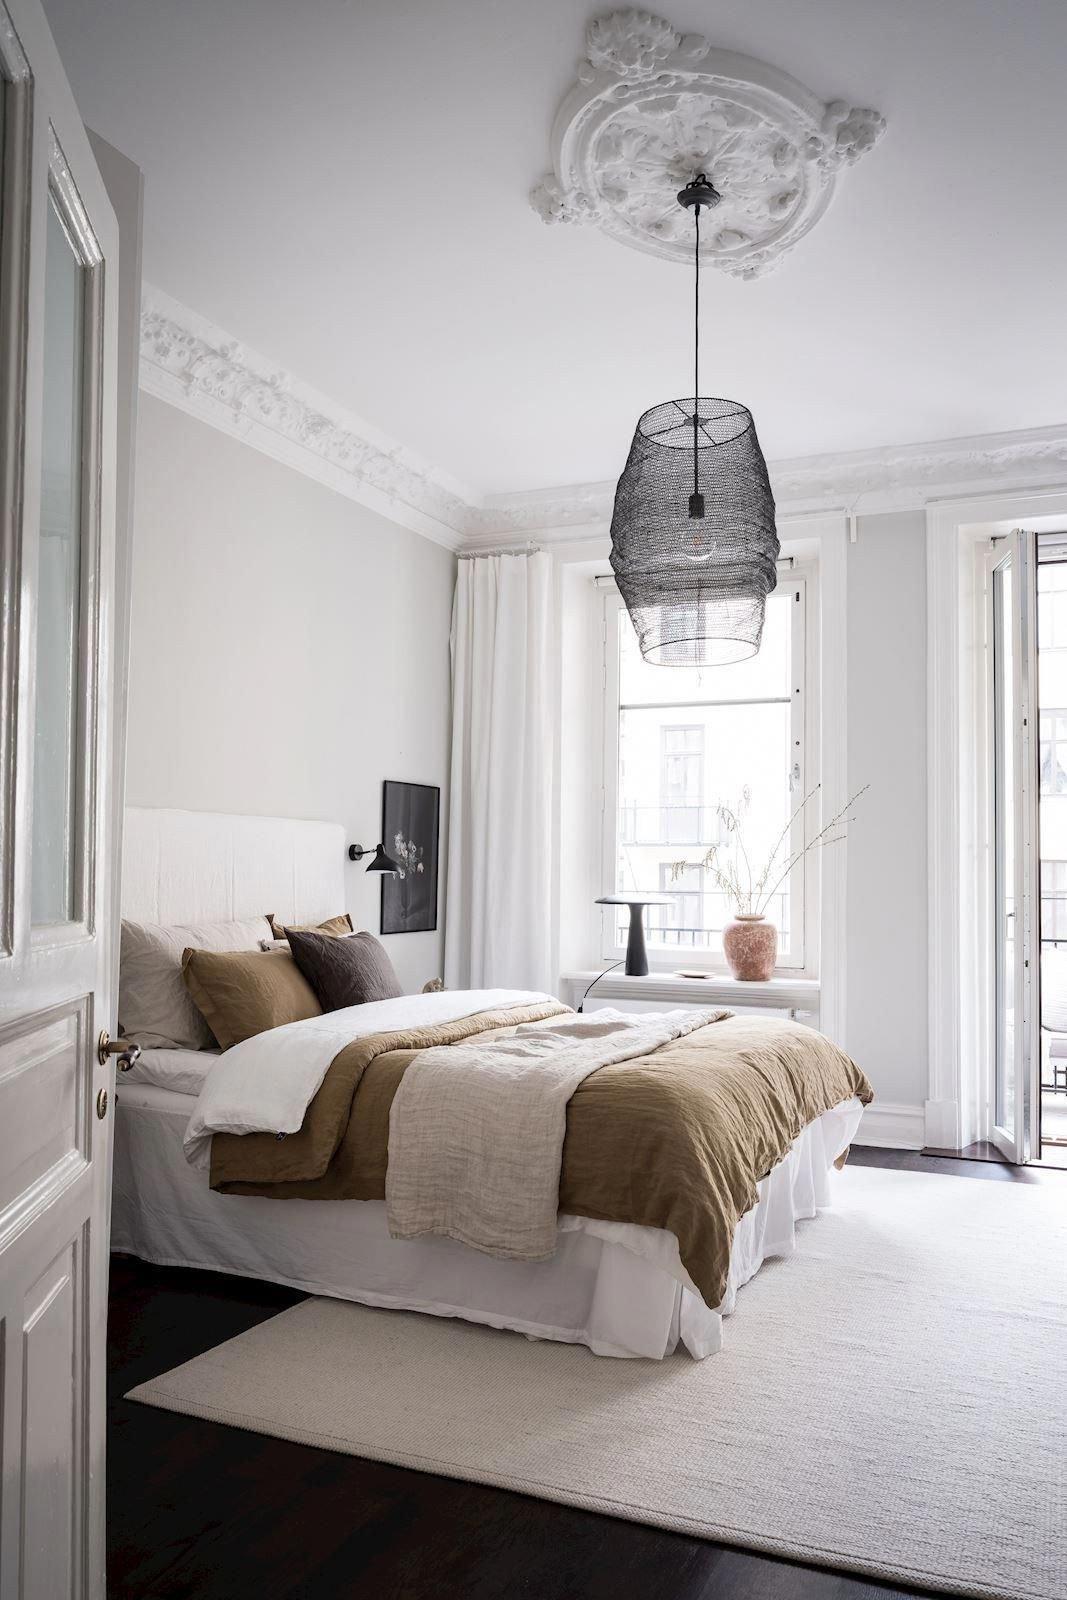 Dark Wood Floor Bedroom Unique This Beautiful Turn Of the Century Home with Dark Wooden